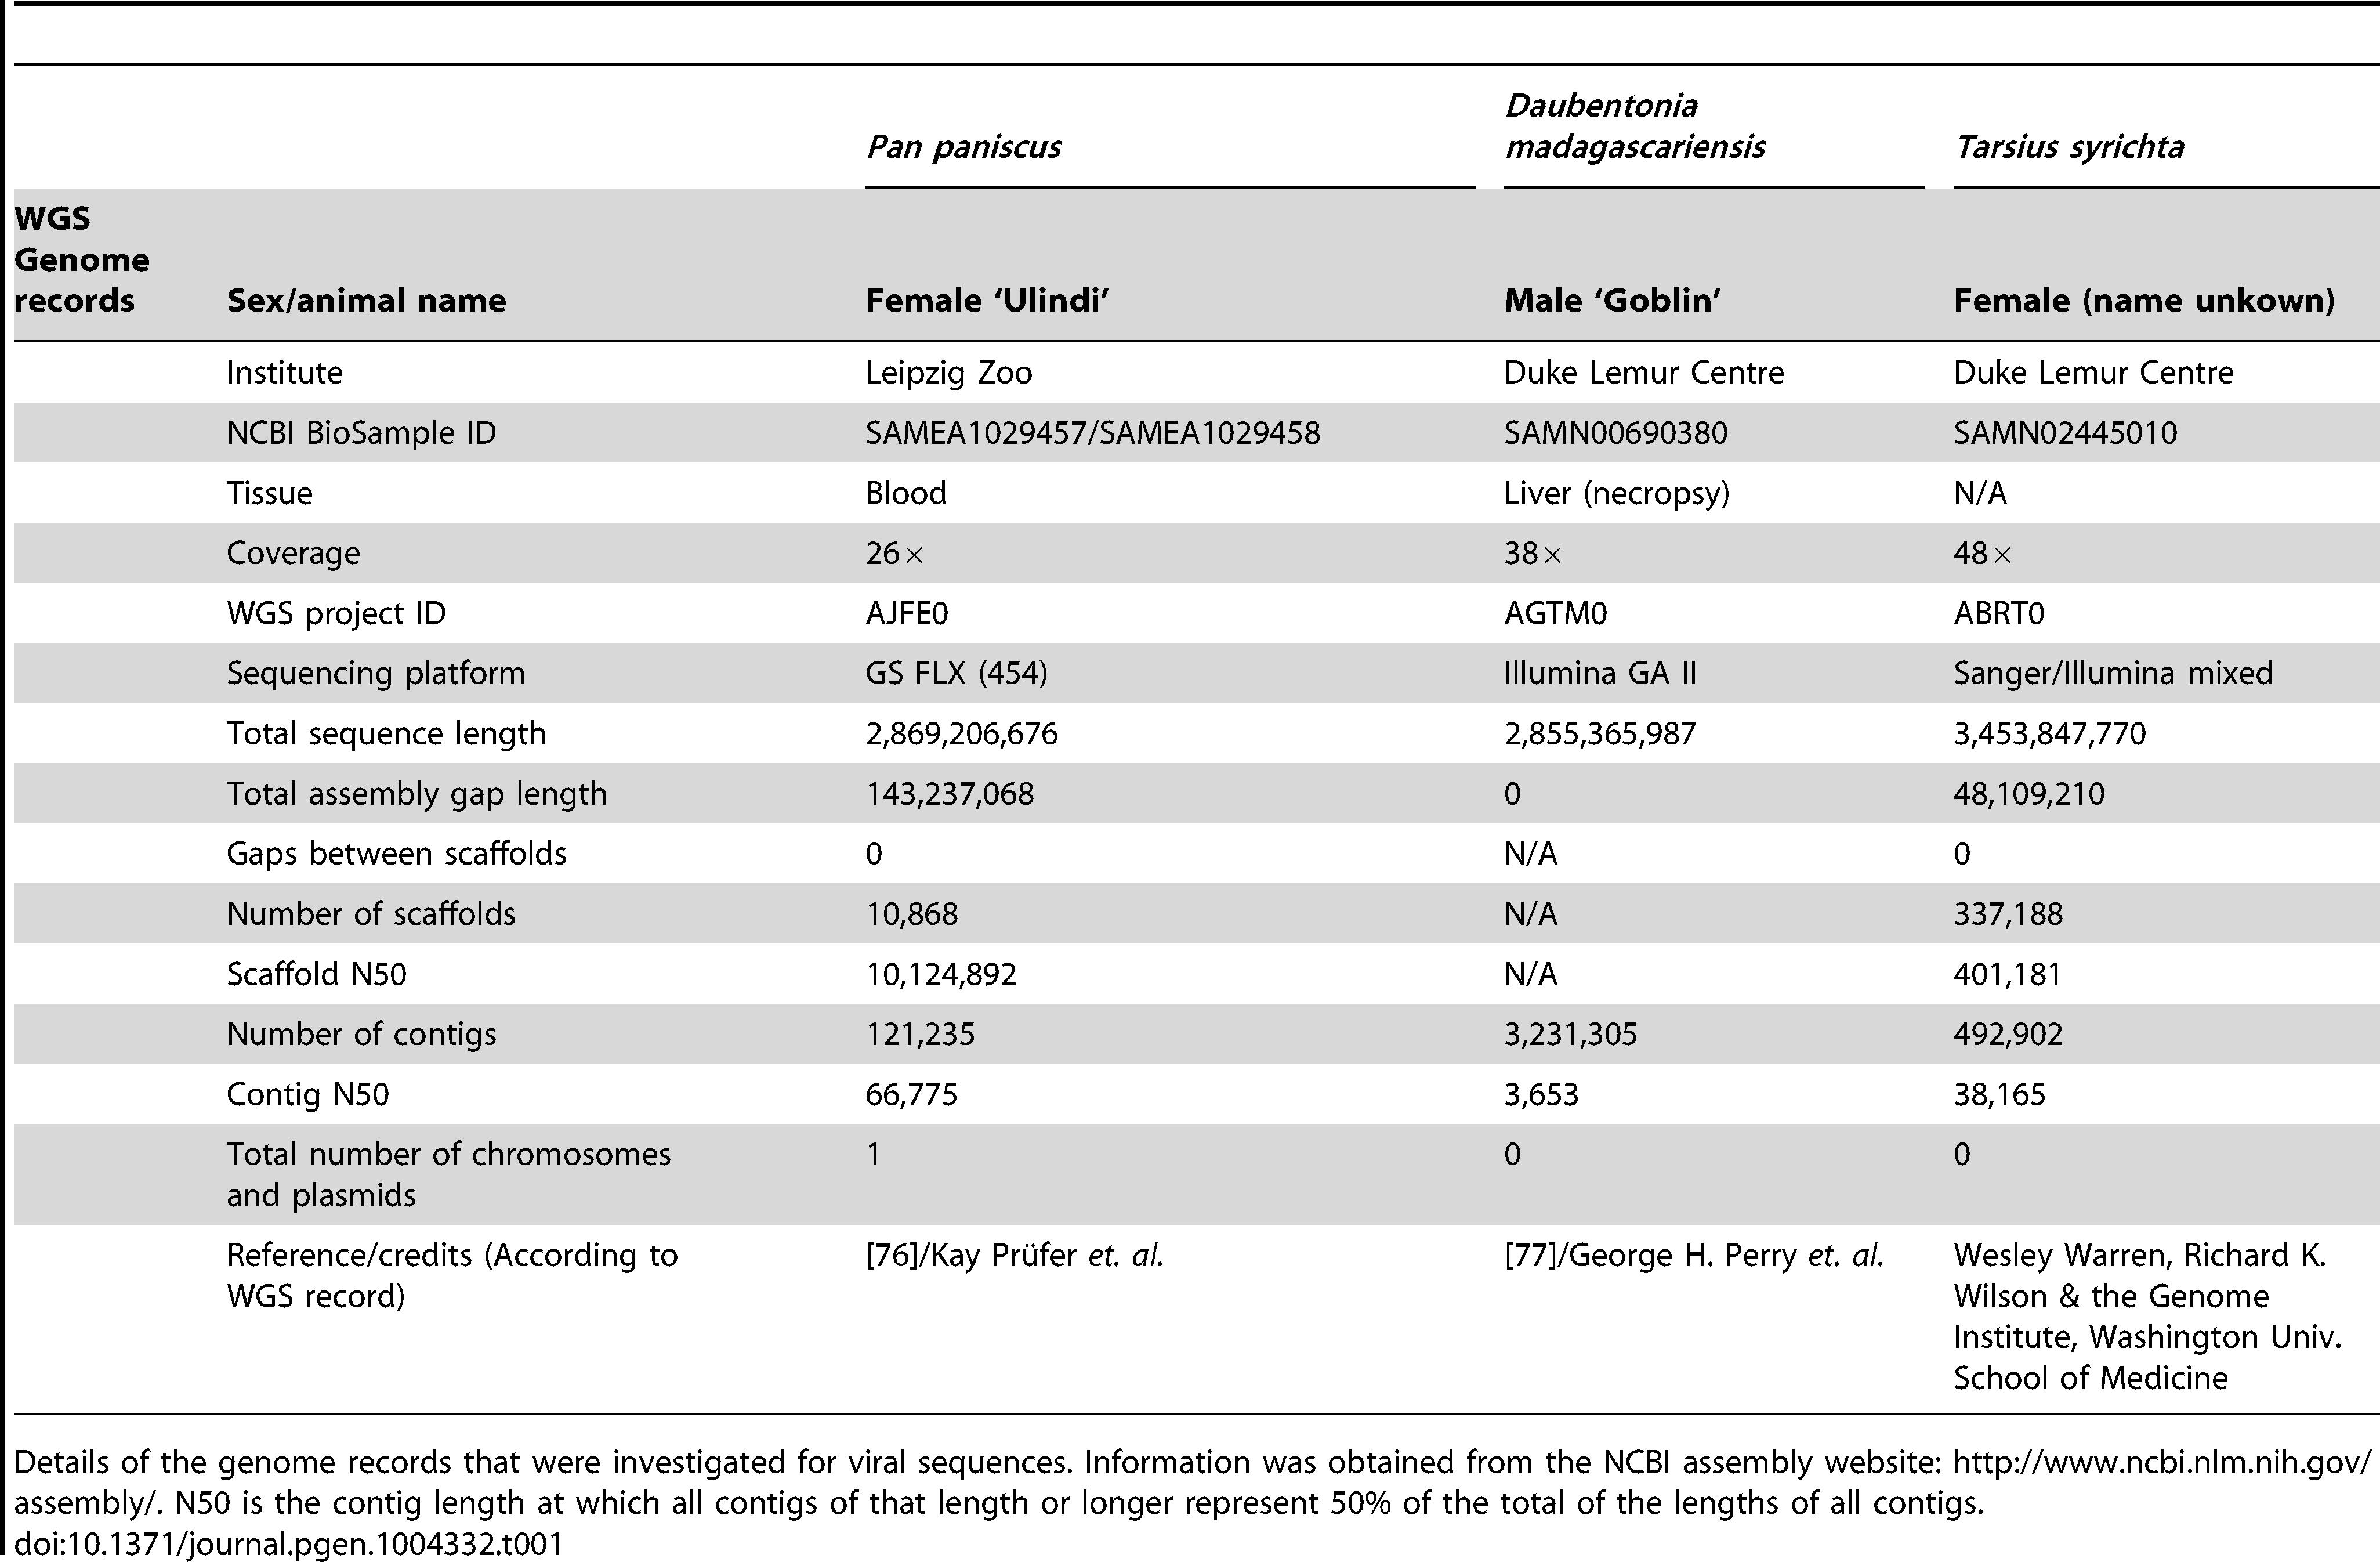 Genomes containing Herpesvirus-like sequences.